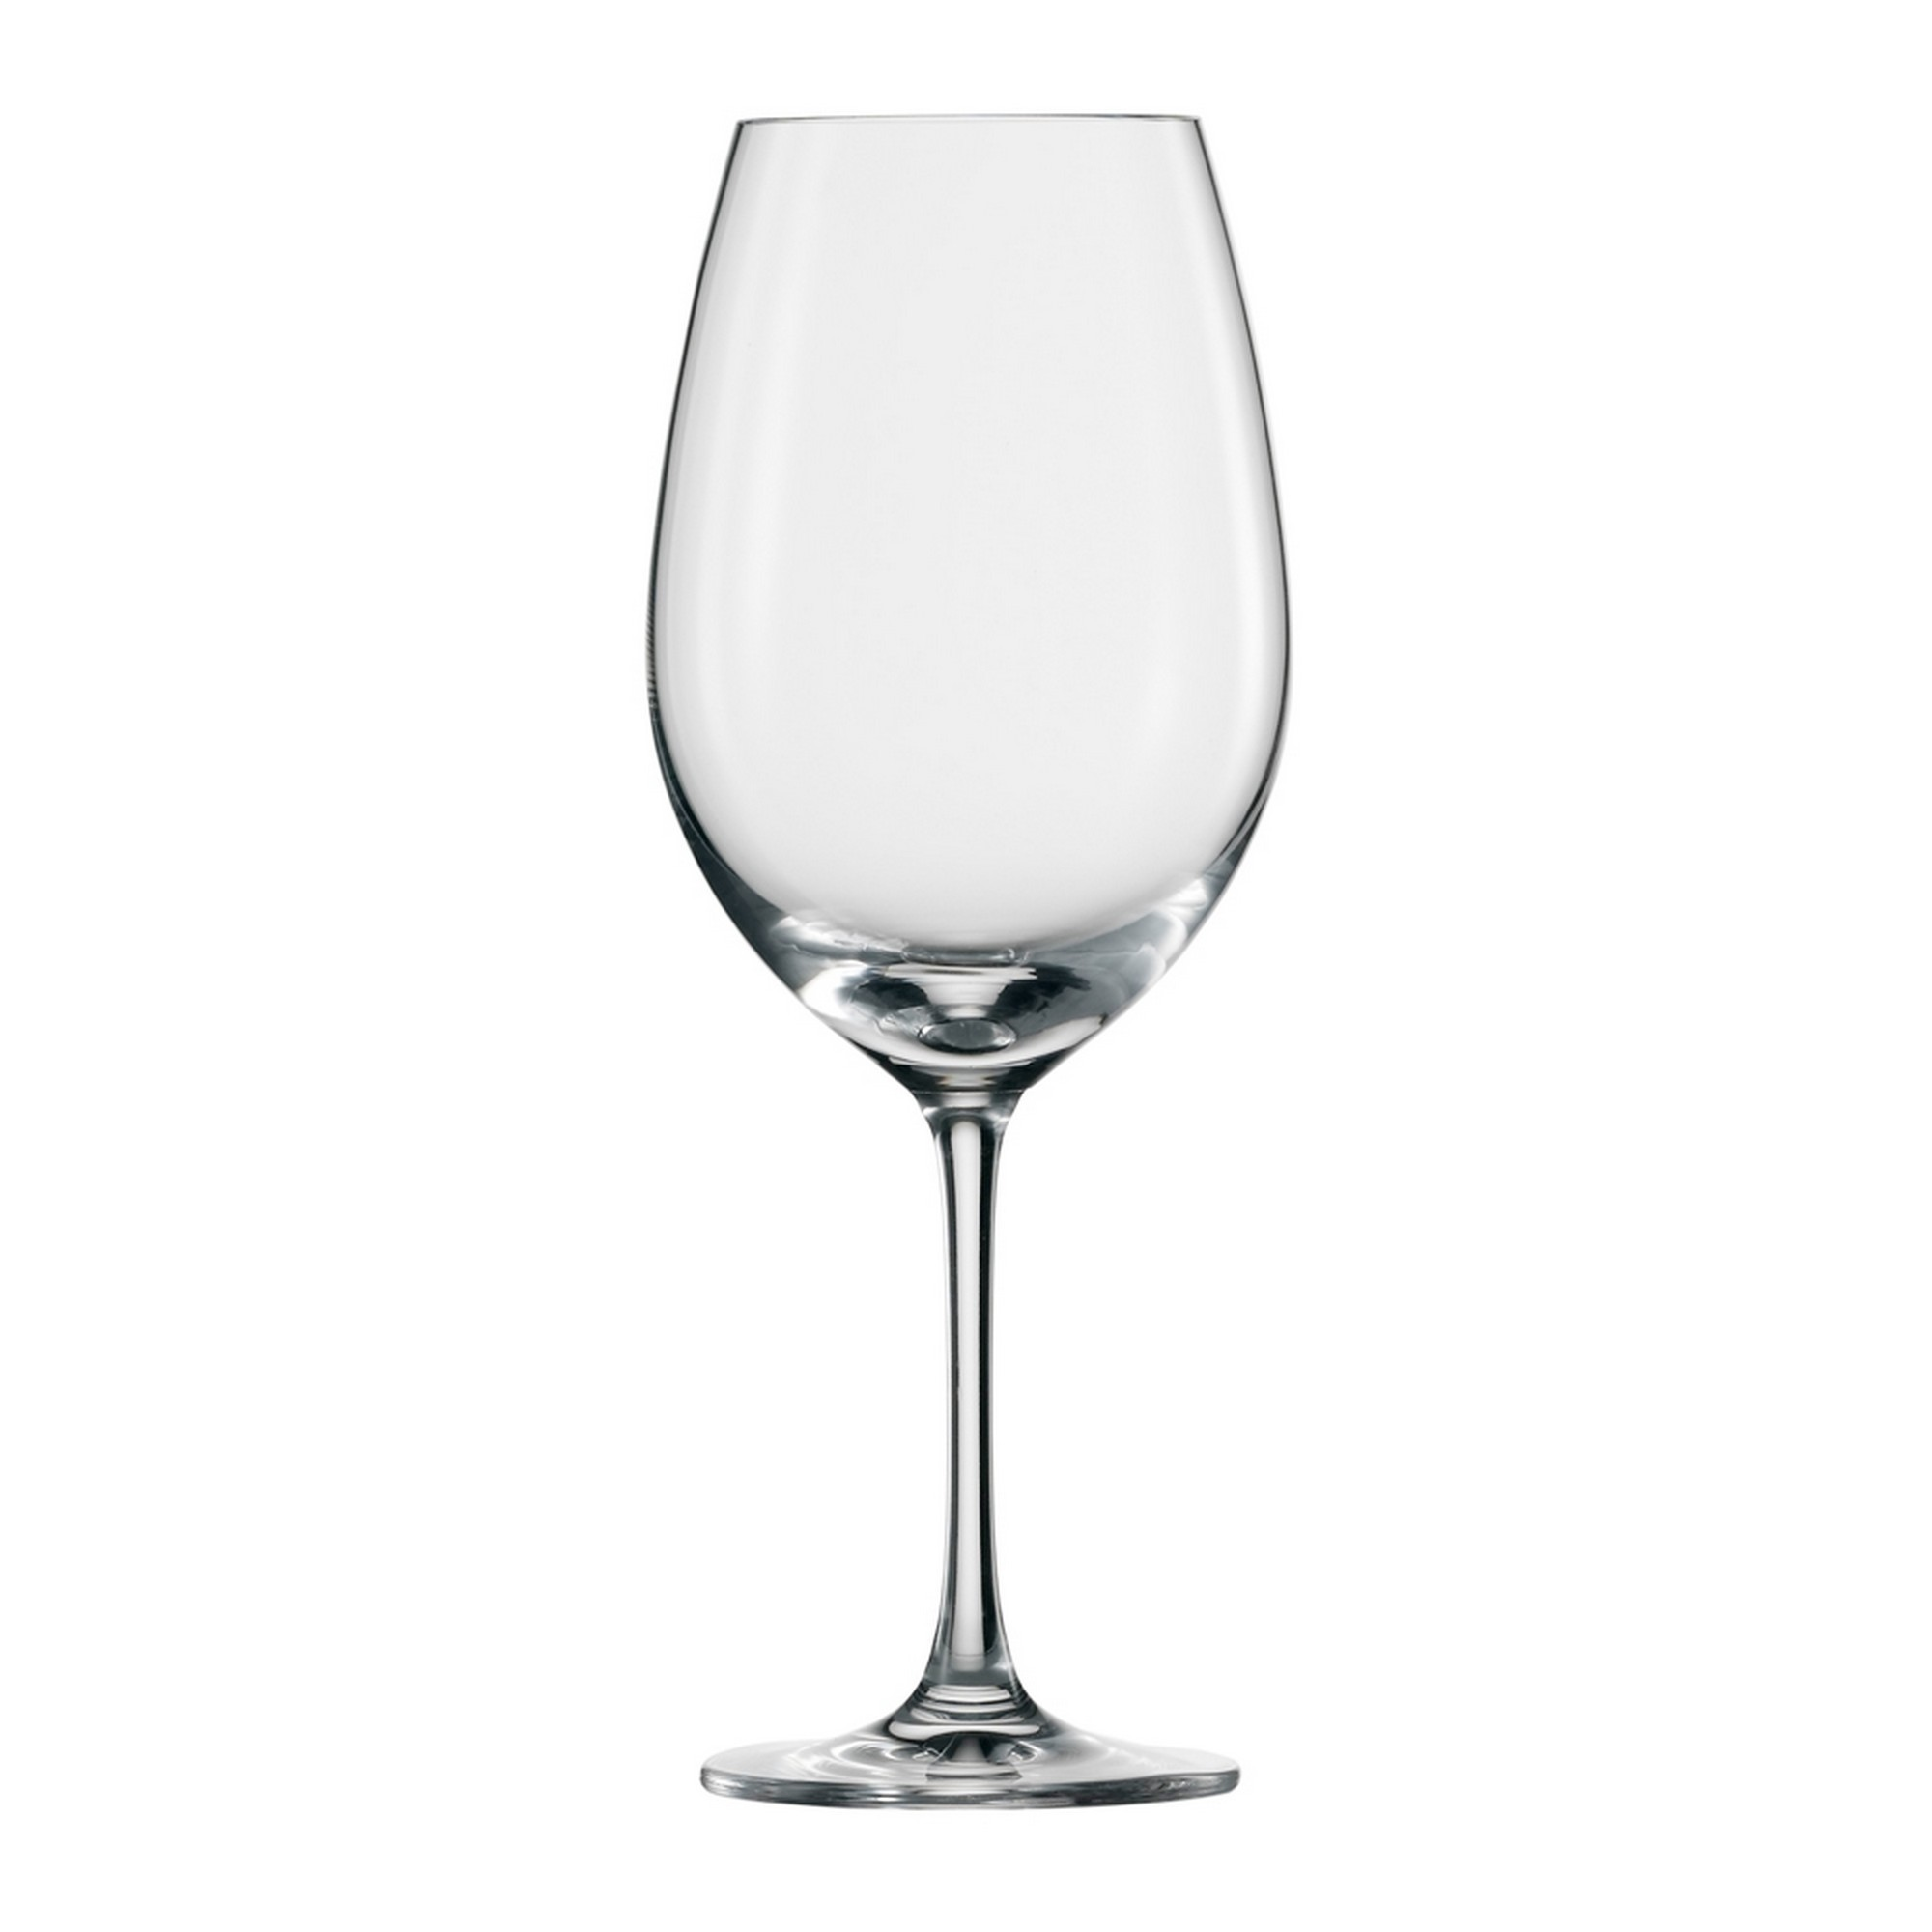 Taça para Vinho Tinto 506ml Schott Zwiesel Ivento 6 Peças de Cristal